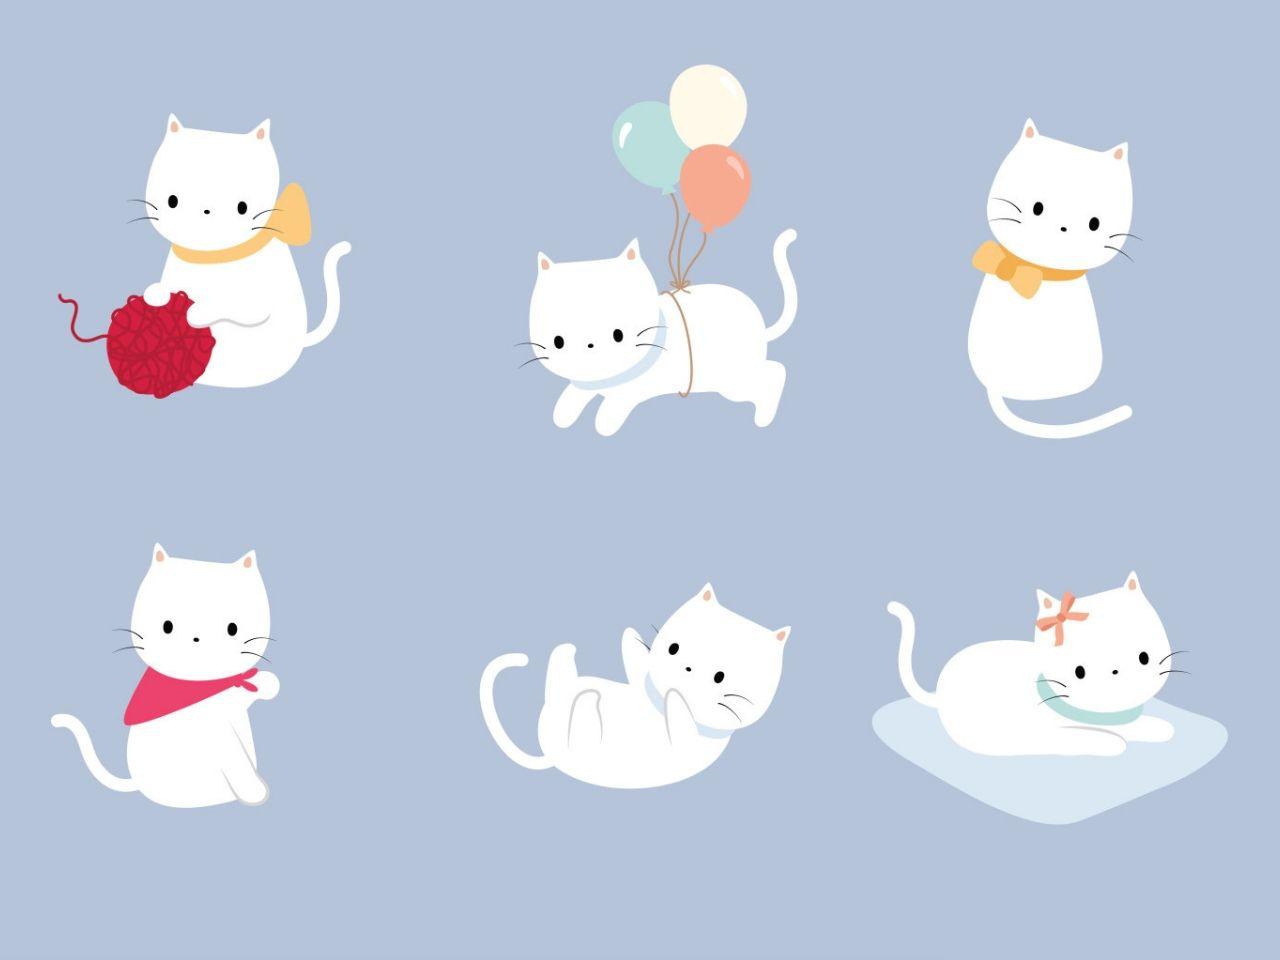 Gambar Kaki Kucing Kartun Wwwtollebildcom